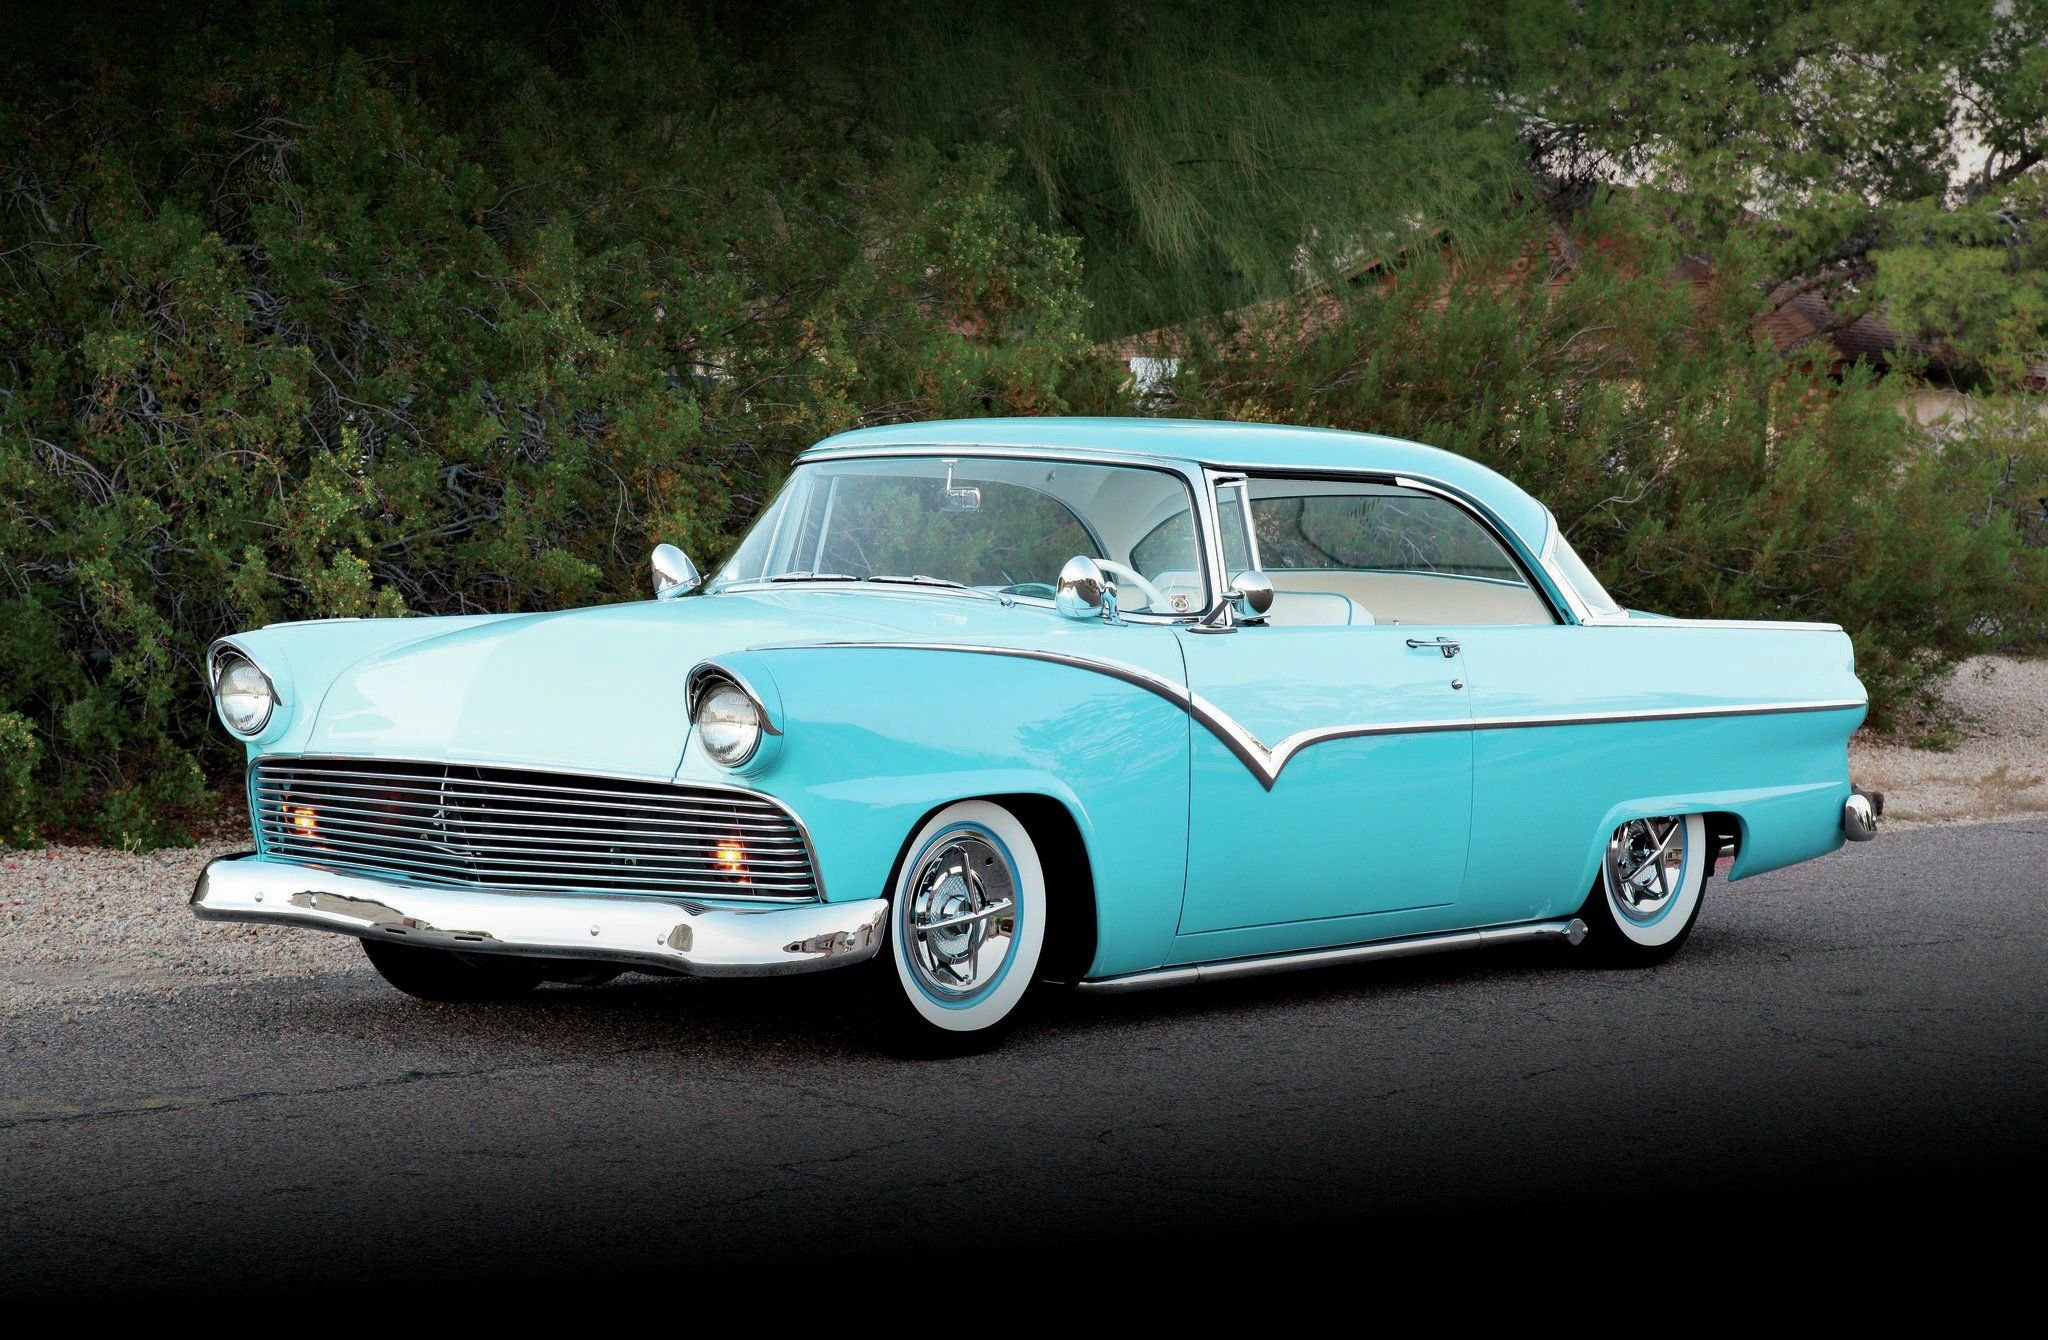 1955 Ford Victoria Hardtop-01 wallpaper